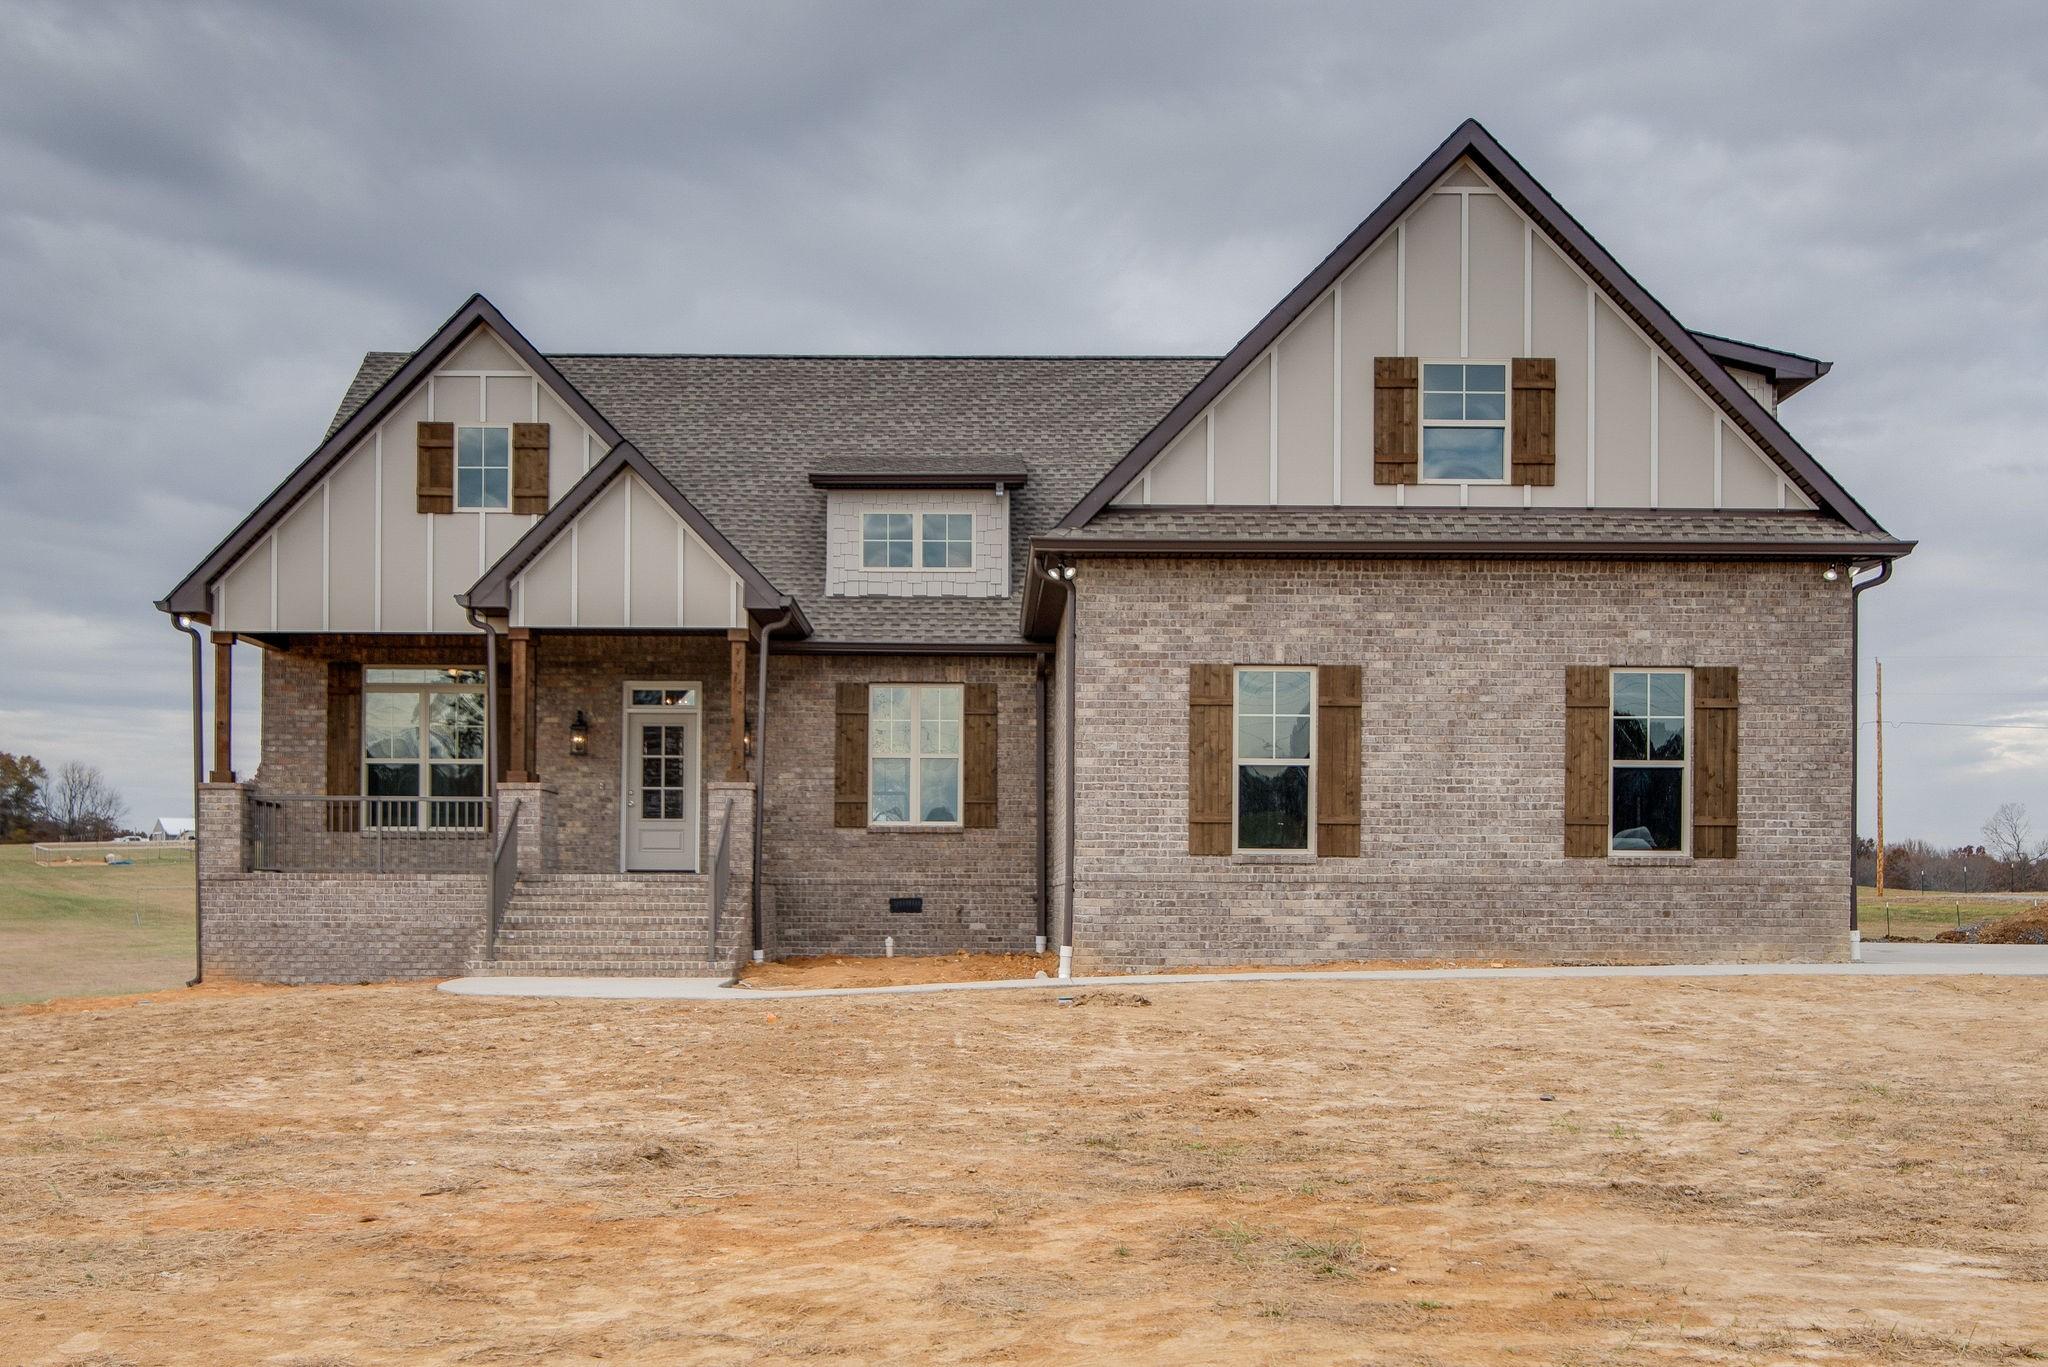 405 Halltown Road, Cottontown, TN 37048 - Cottontown, TN real estate listing